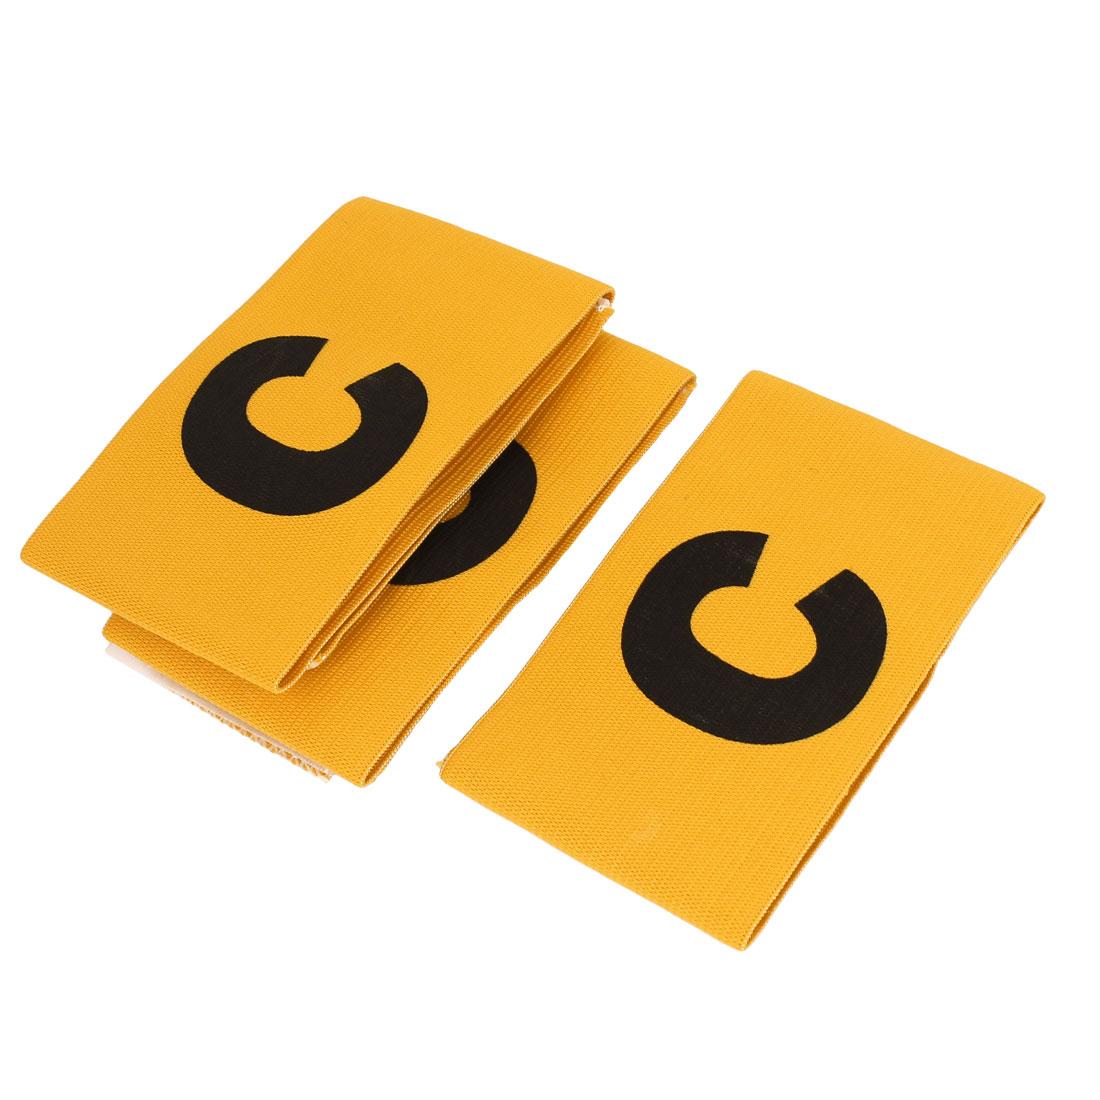 3pcs Letter C Pattern Soccer Football Tension Elastic Captain Armband Yellow